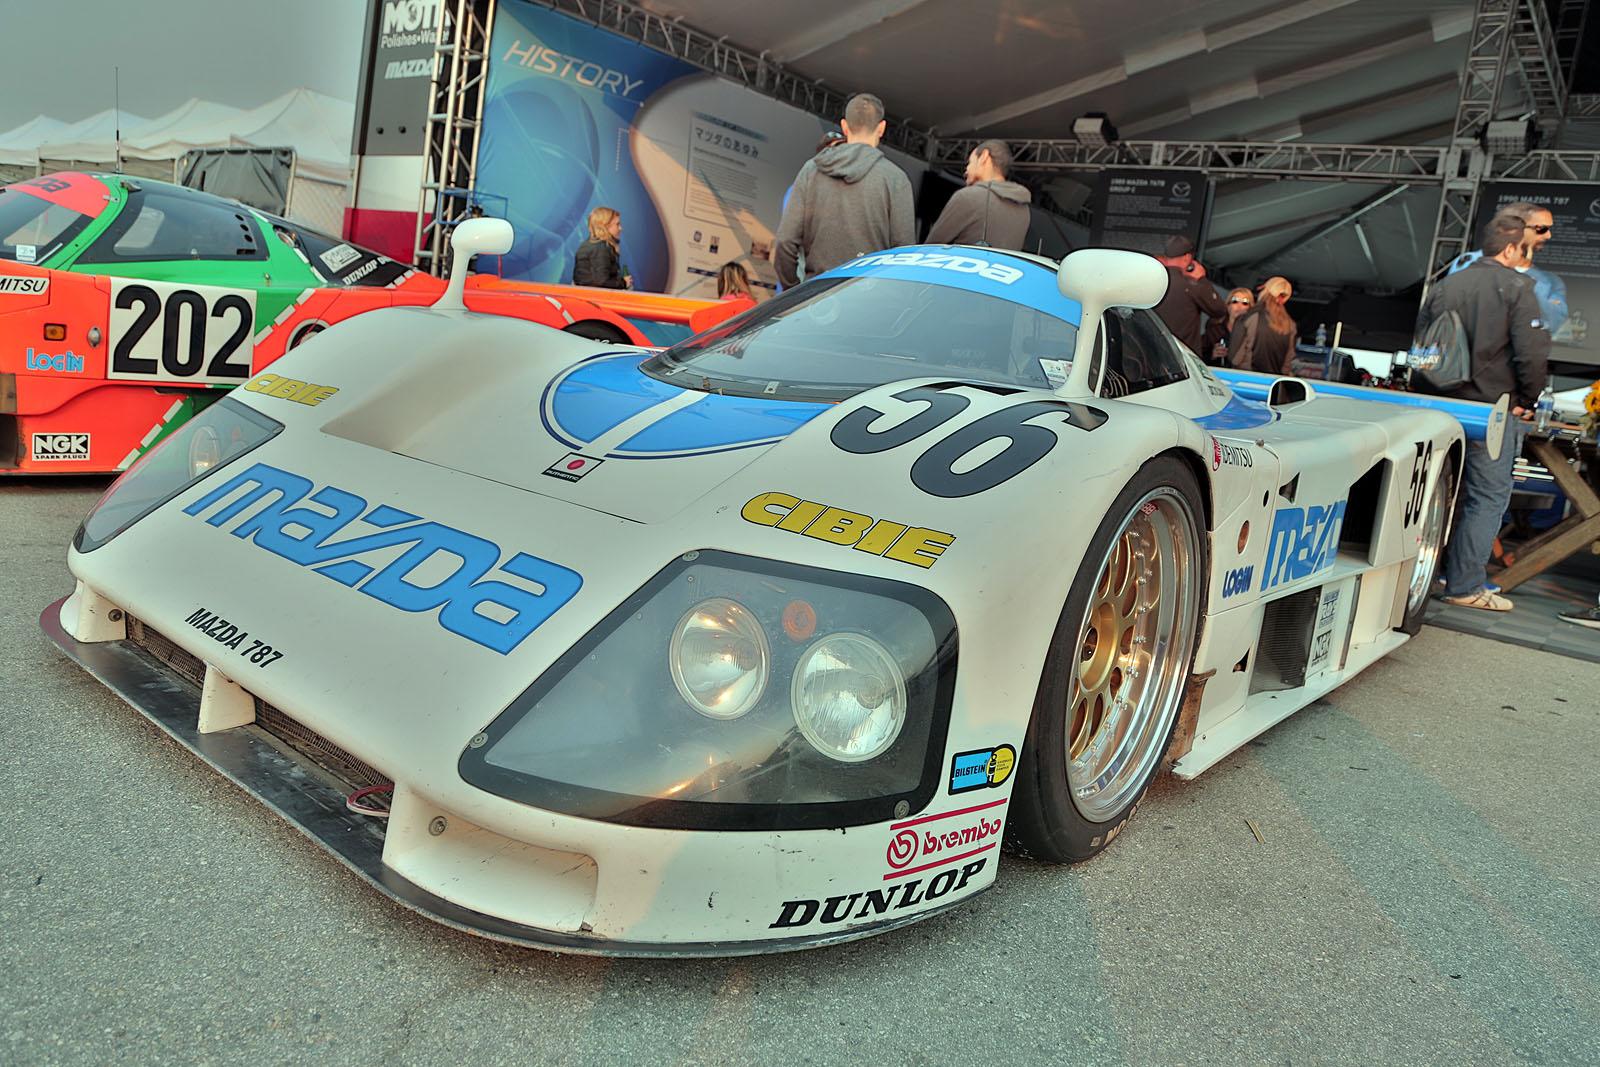 Mazda-at-Monterey-Motorsports-Reunion-09